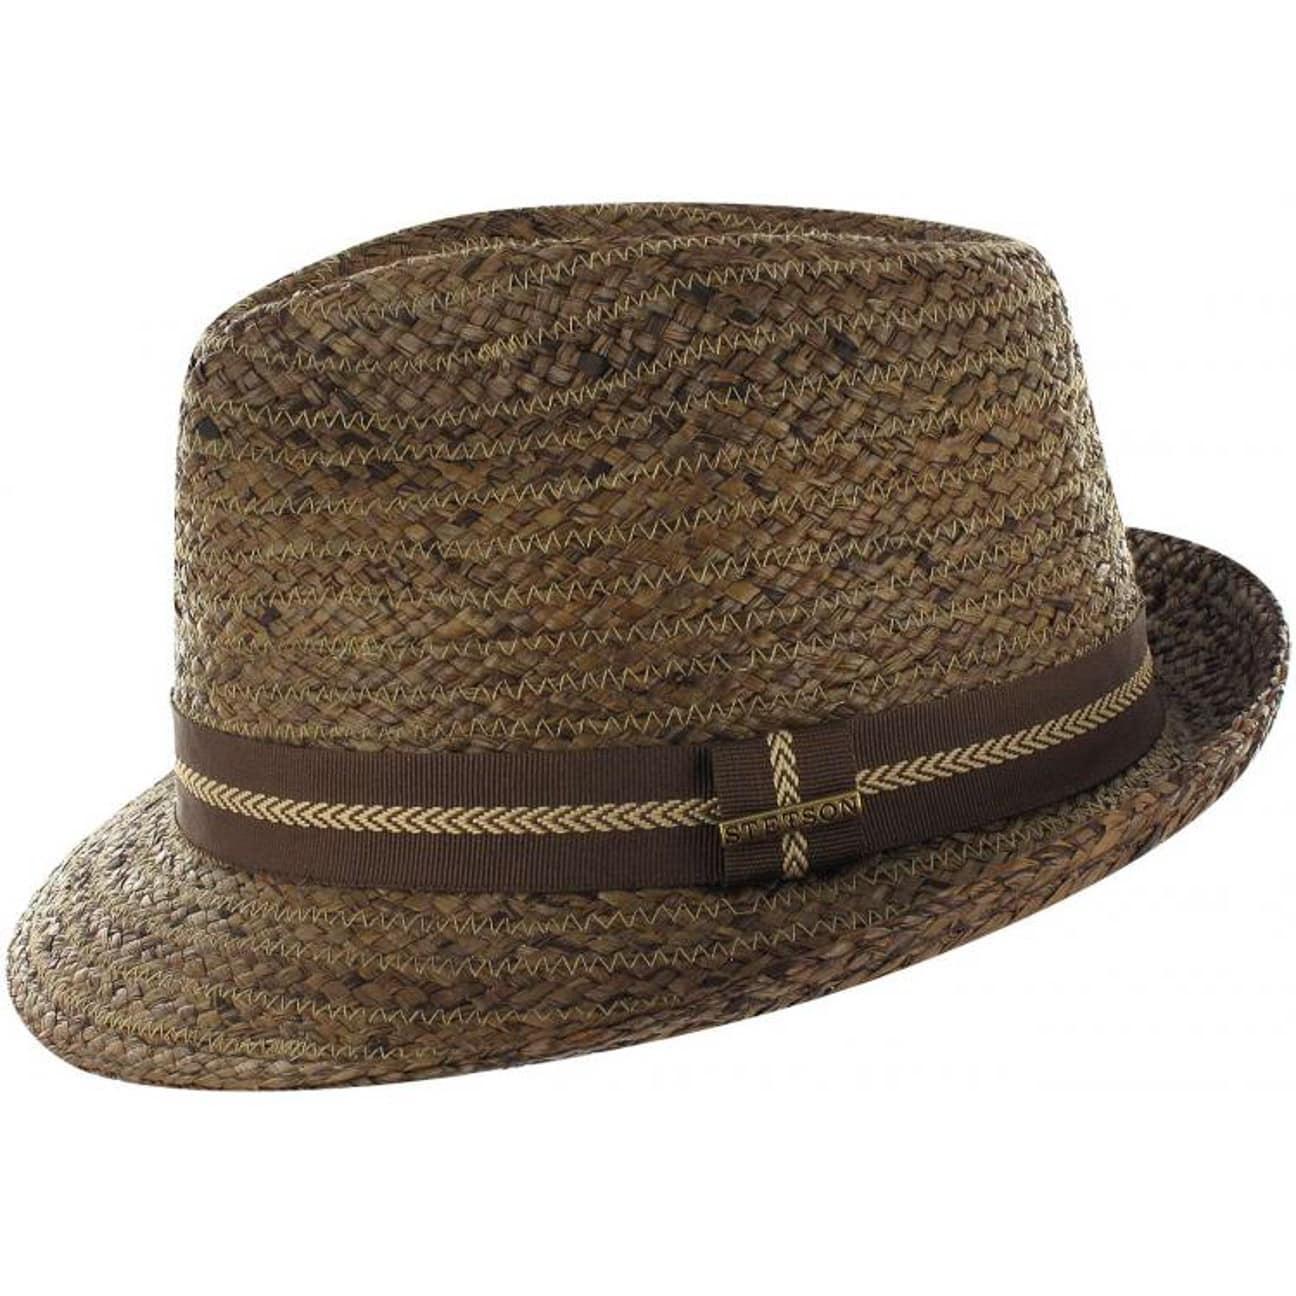 Pulaski Raffia Straw Trilby by Stetson - brown 1 ... 4528241683a